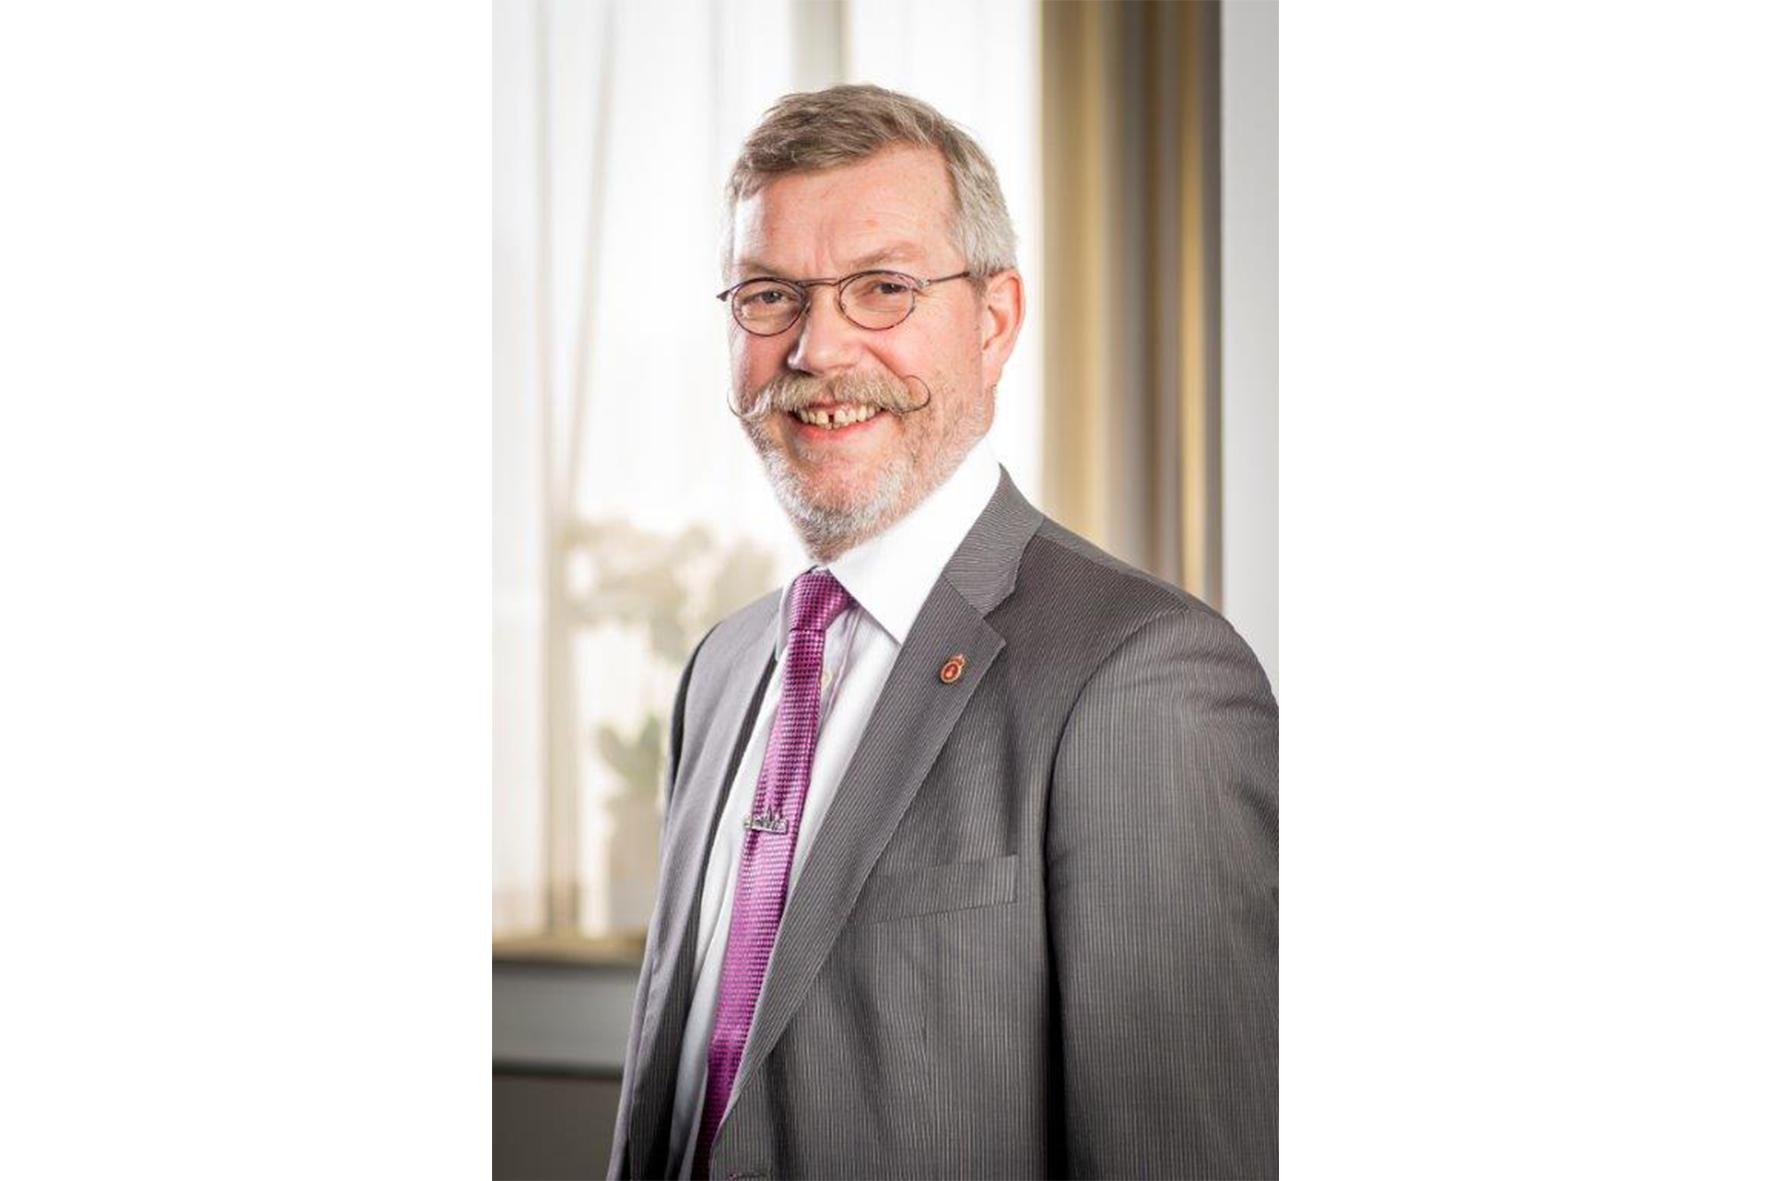 Anders Thorgaard. Head of Operations Norway & Sweden, Group Operations, Danske Bank. Av: Kenneth Stoltz